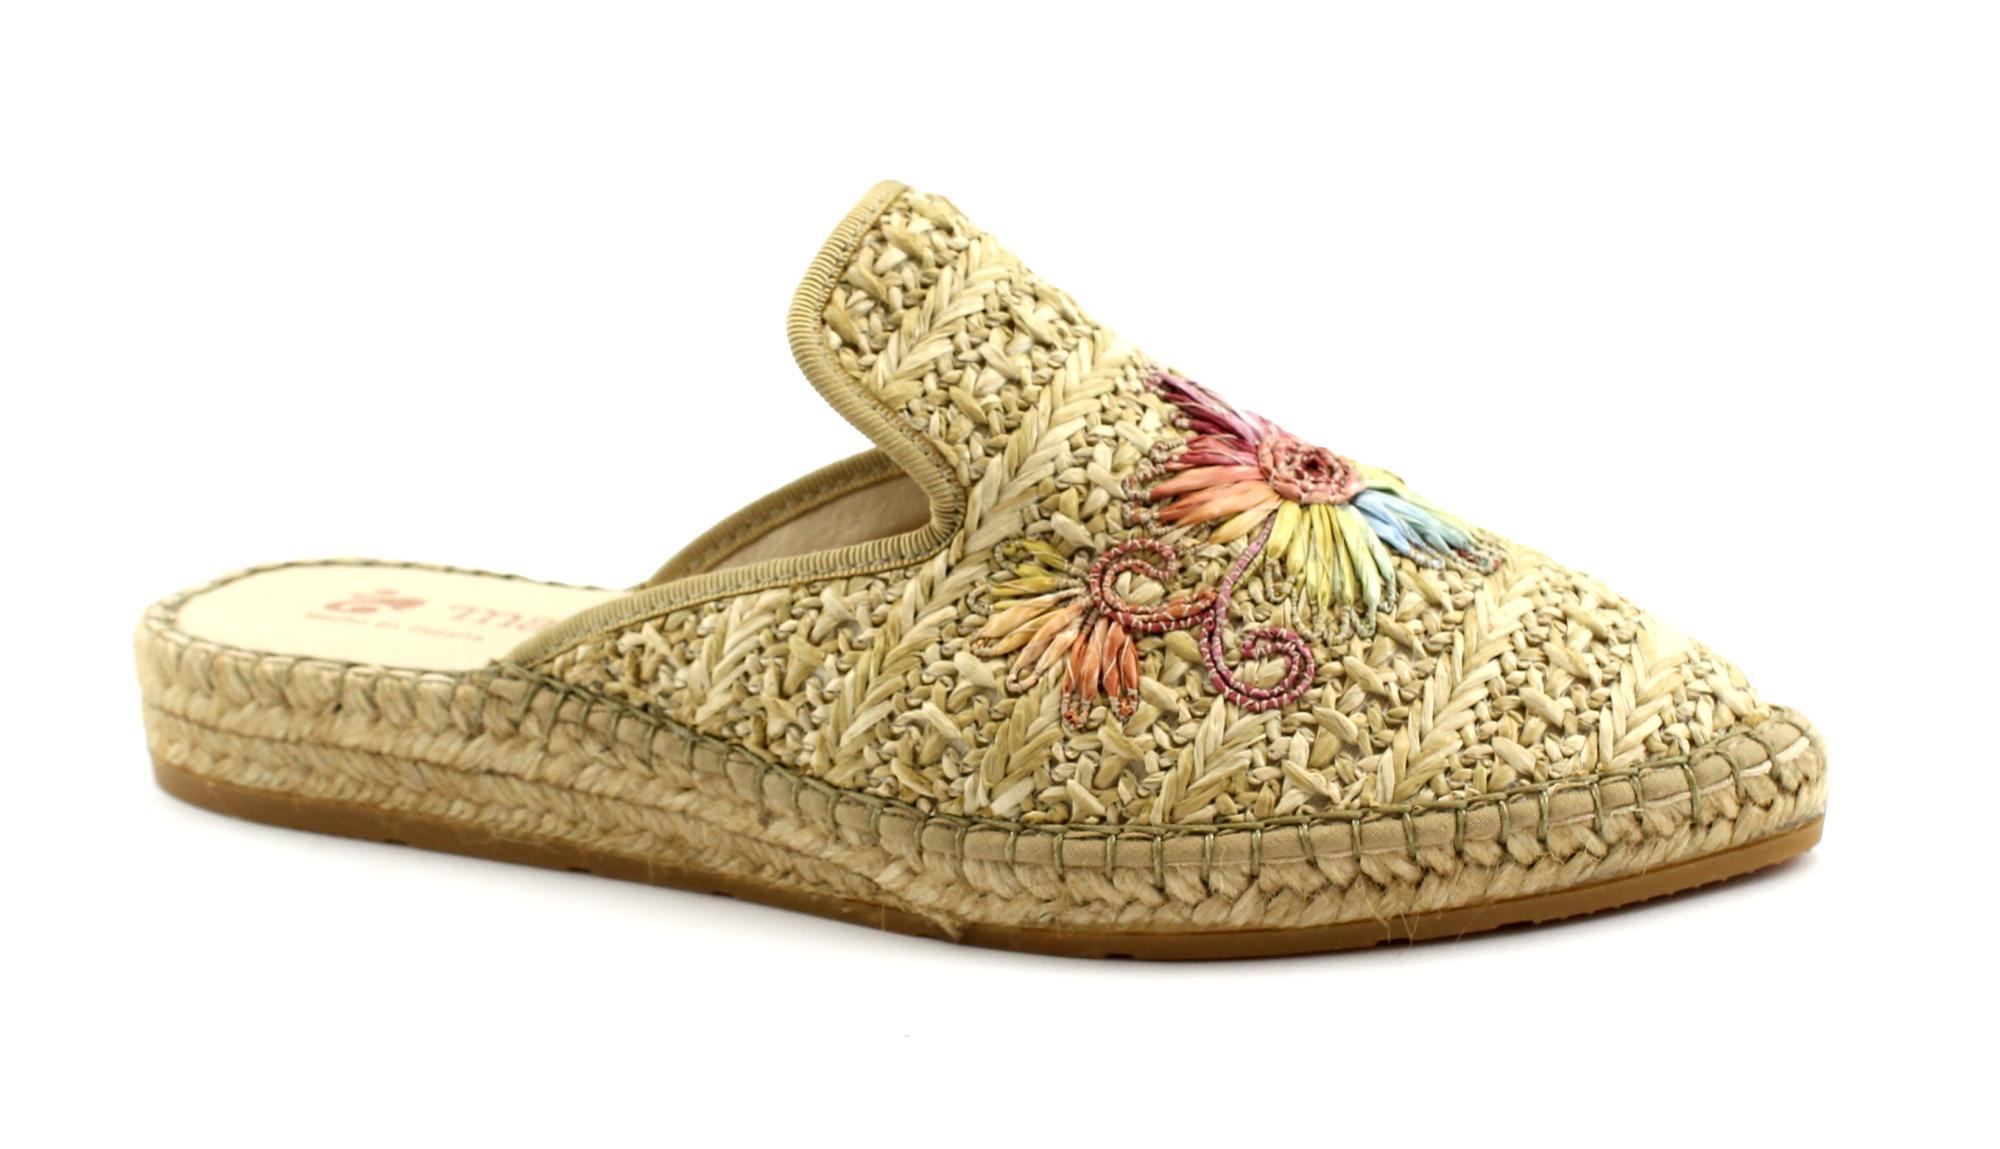 MACARENA IMA30 natural beige scarpe ciabatte donna espadrilles